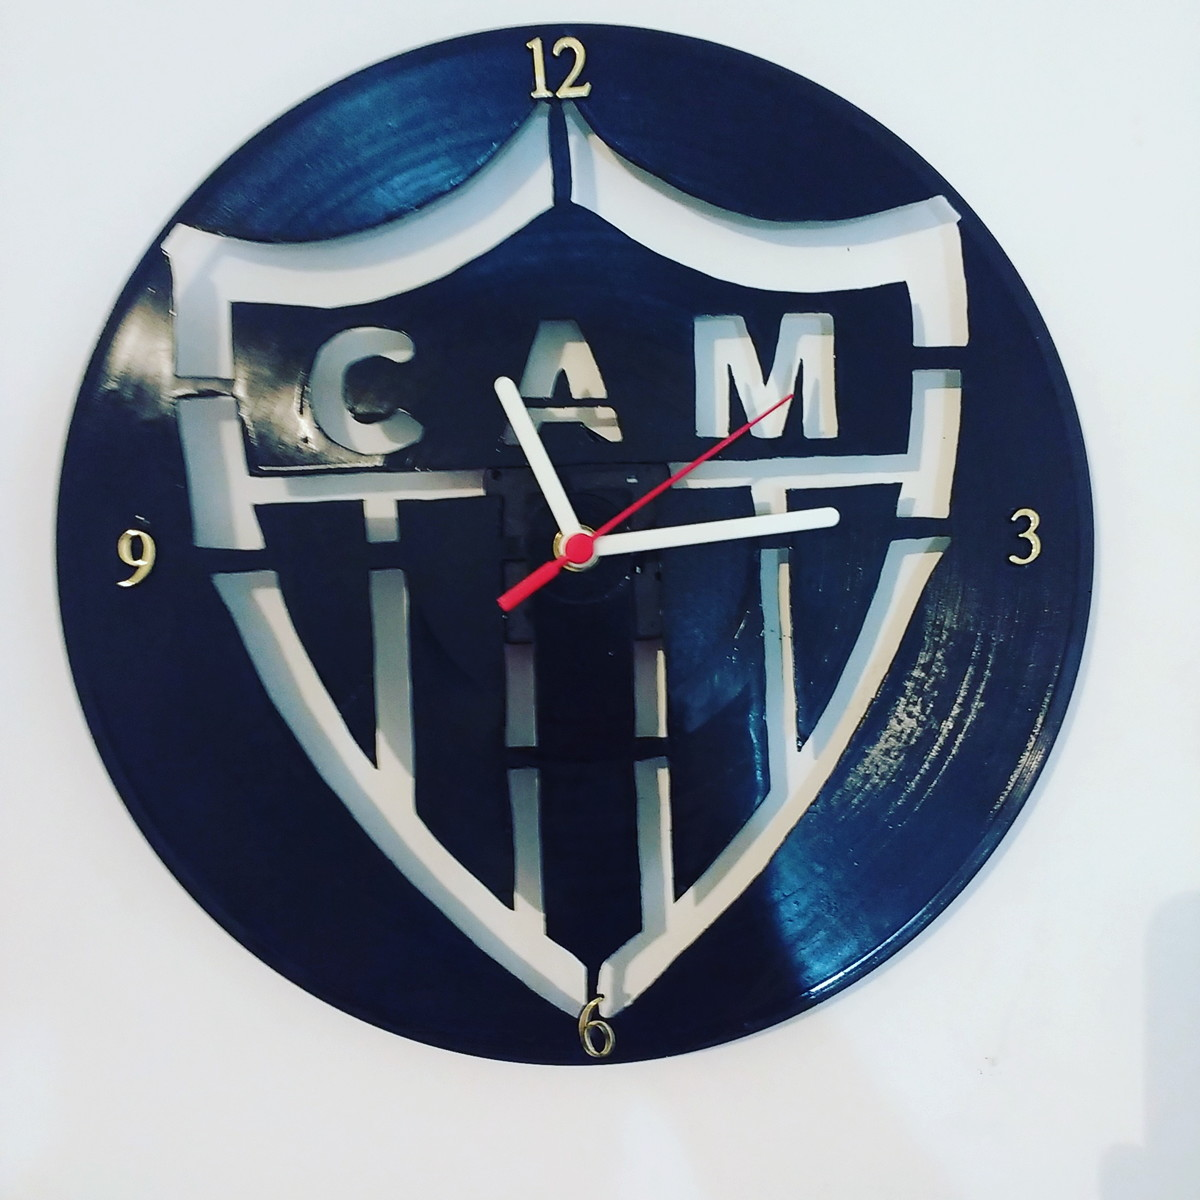 a437f65c8aa Relógio Vintage - Futebol brasileiro - Atlético-MG no Elo7